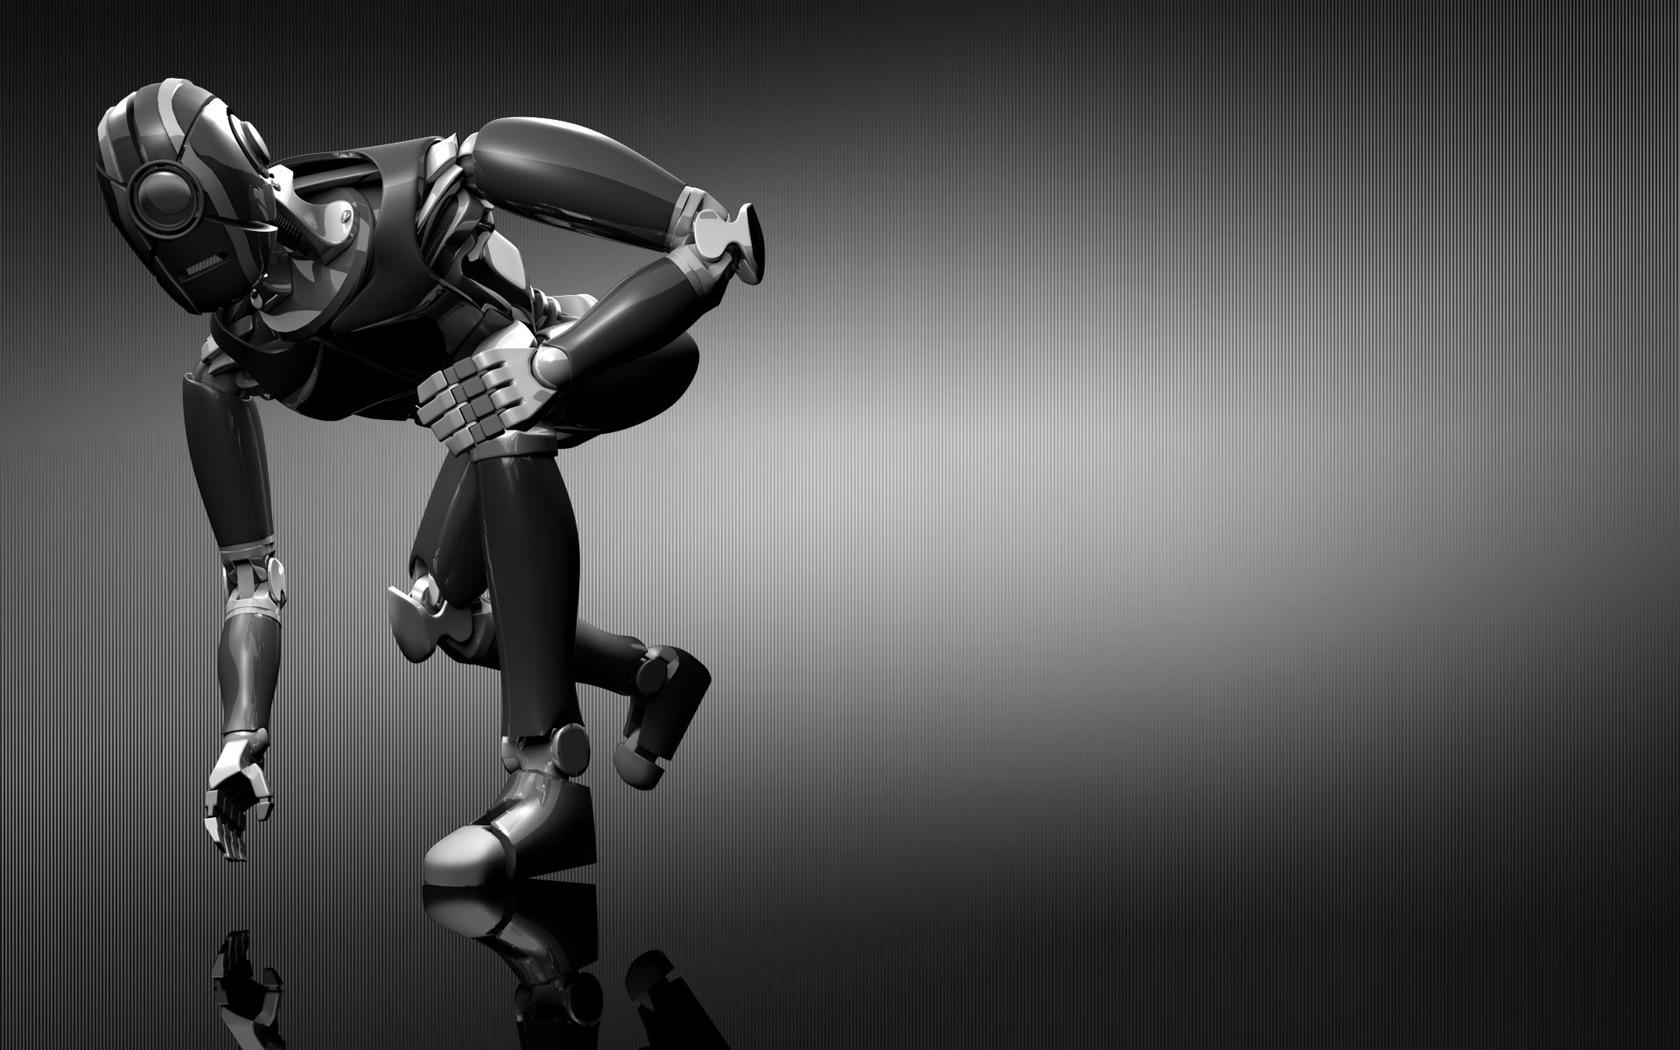 3D Robot Wallpaper Cool 3D Pictures 1680x1050